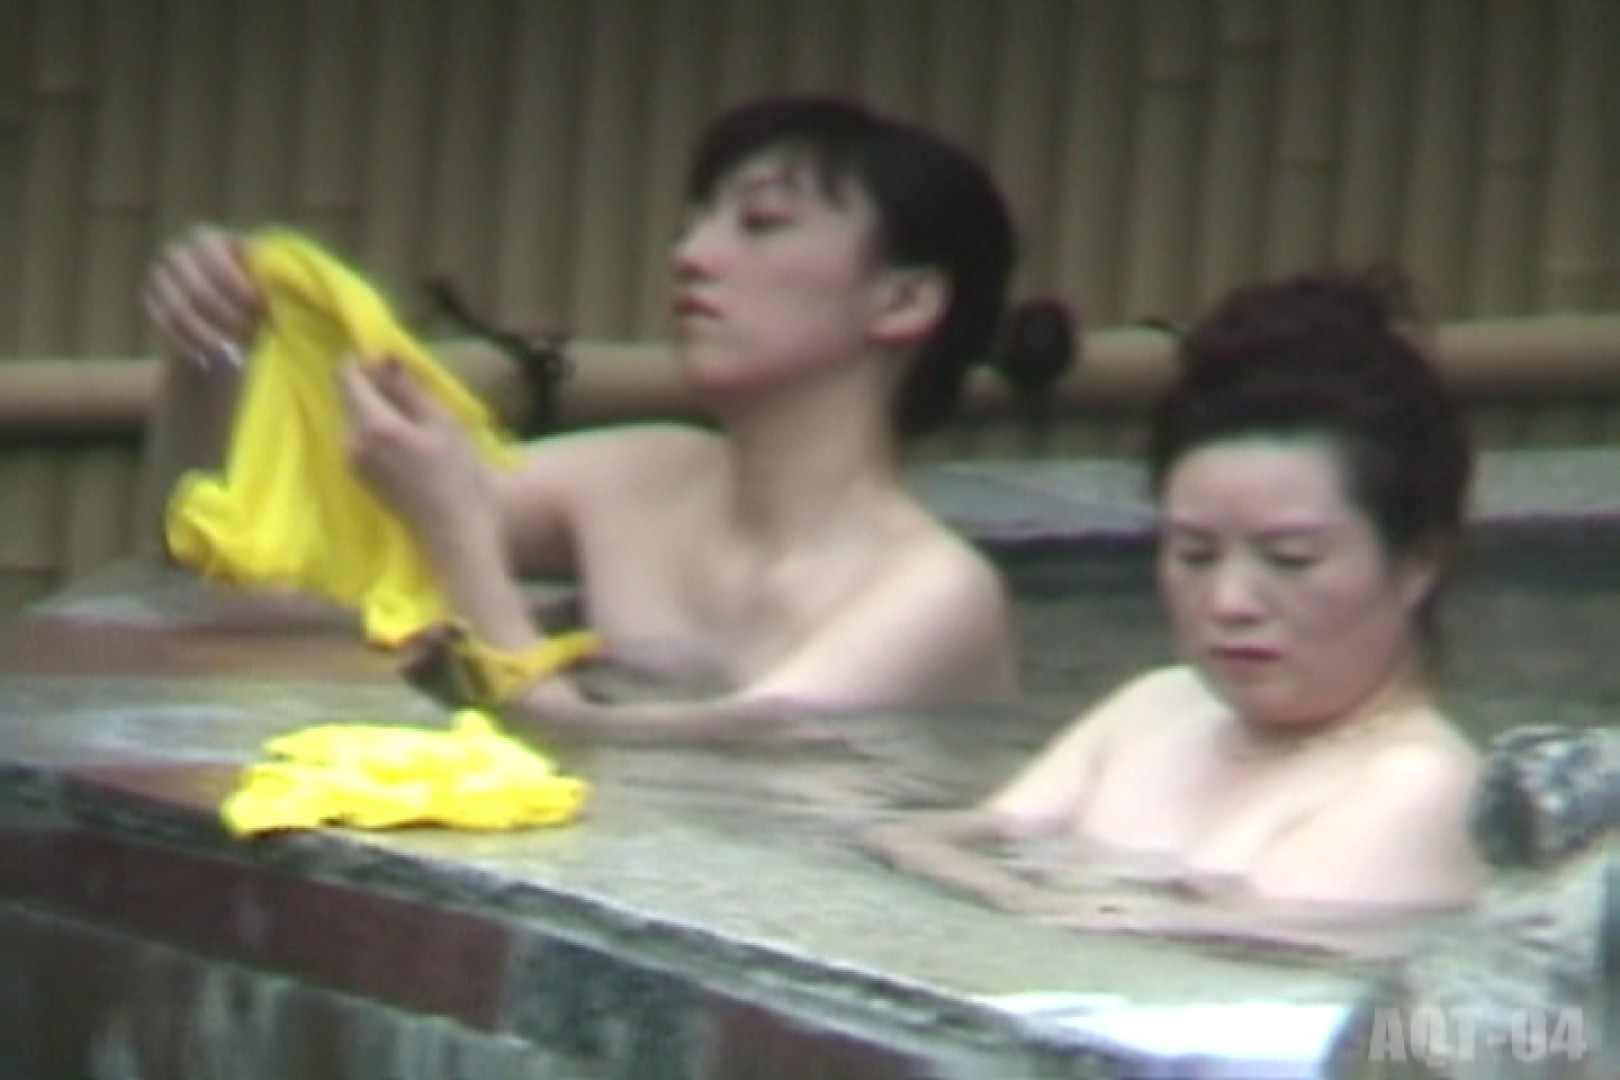 Aquaな露天風呂Vol.743 盗撮師作品 オマンコ無修正動画無料 91pic 86